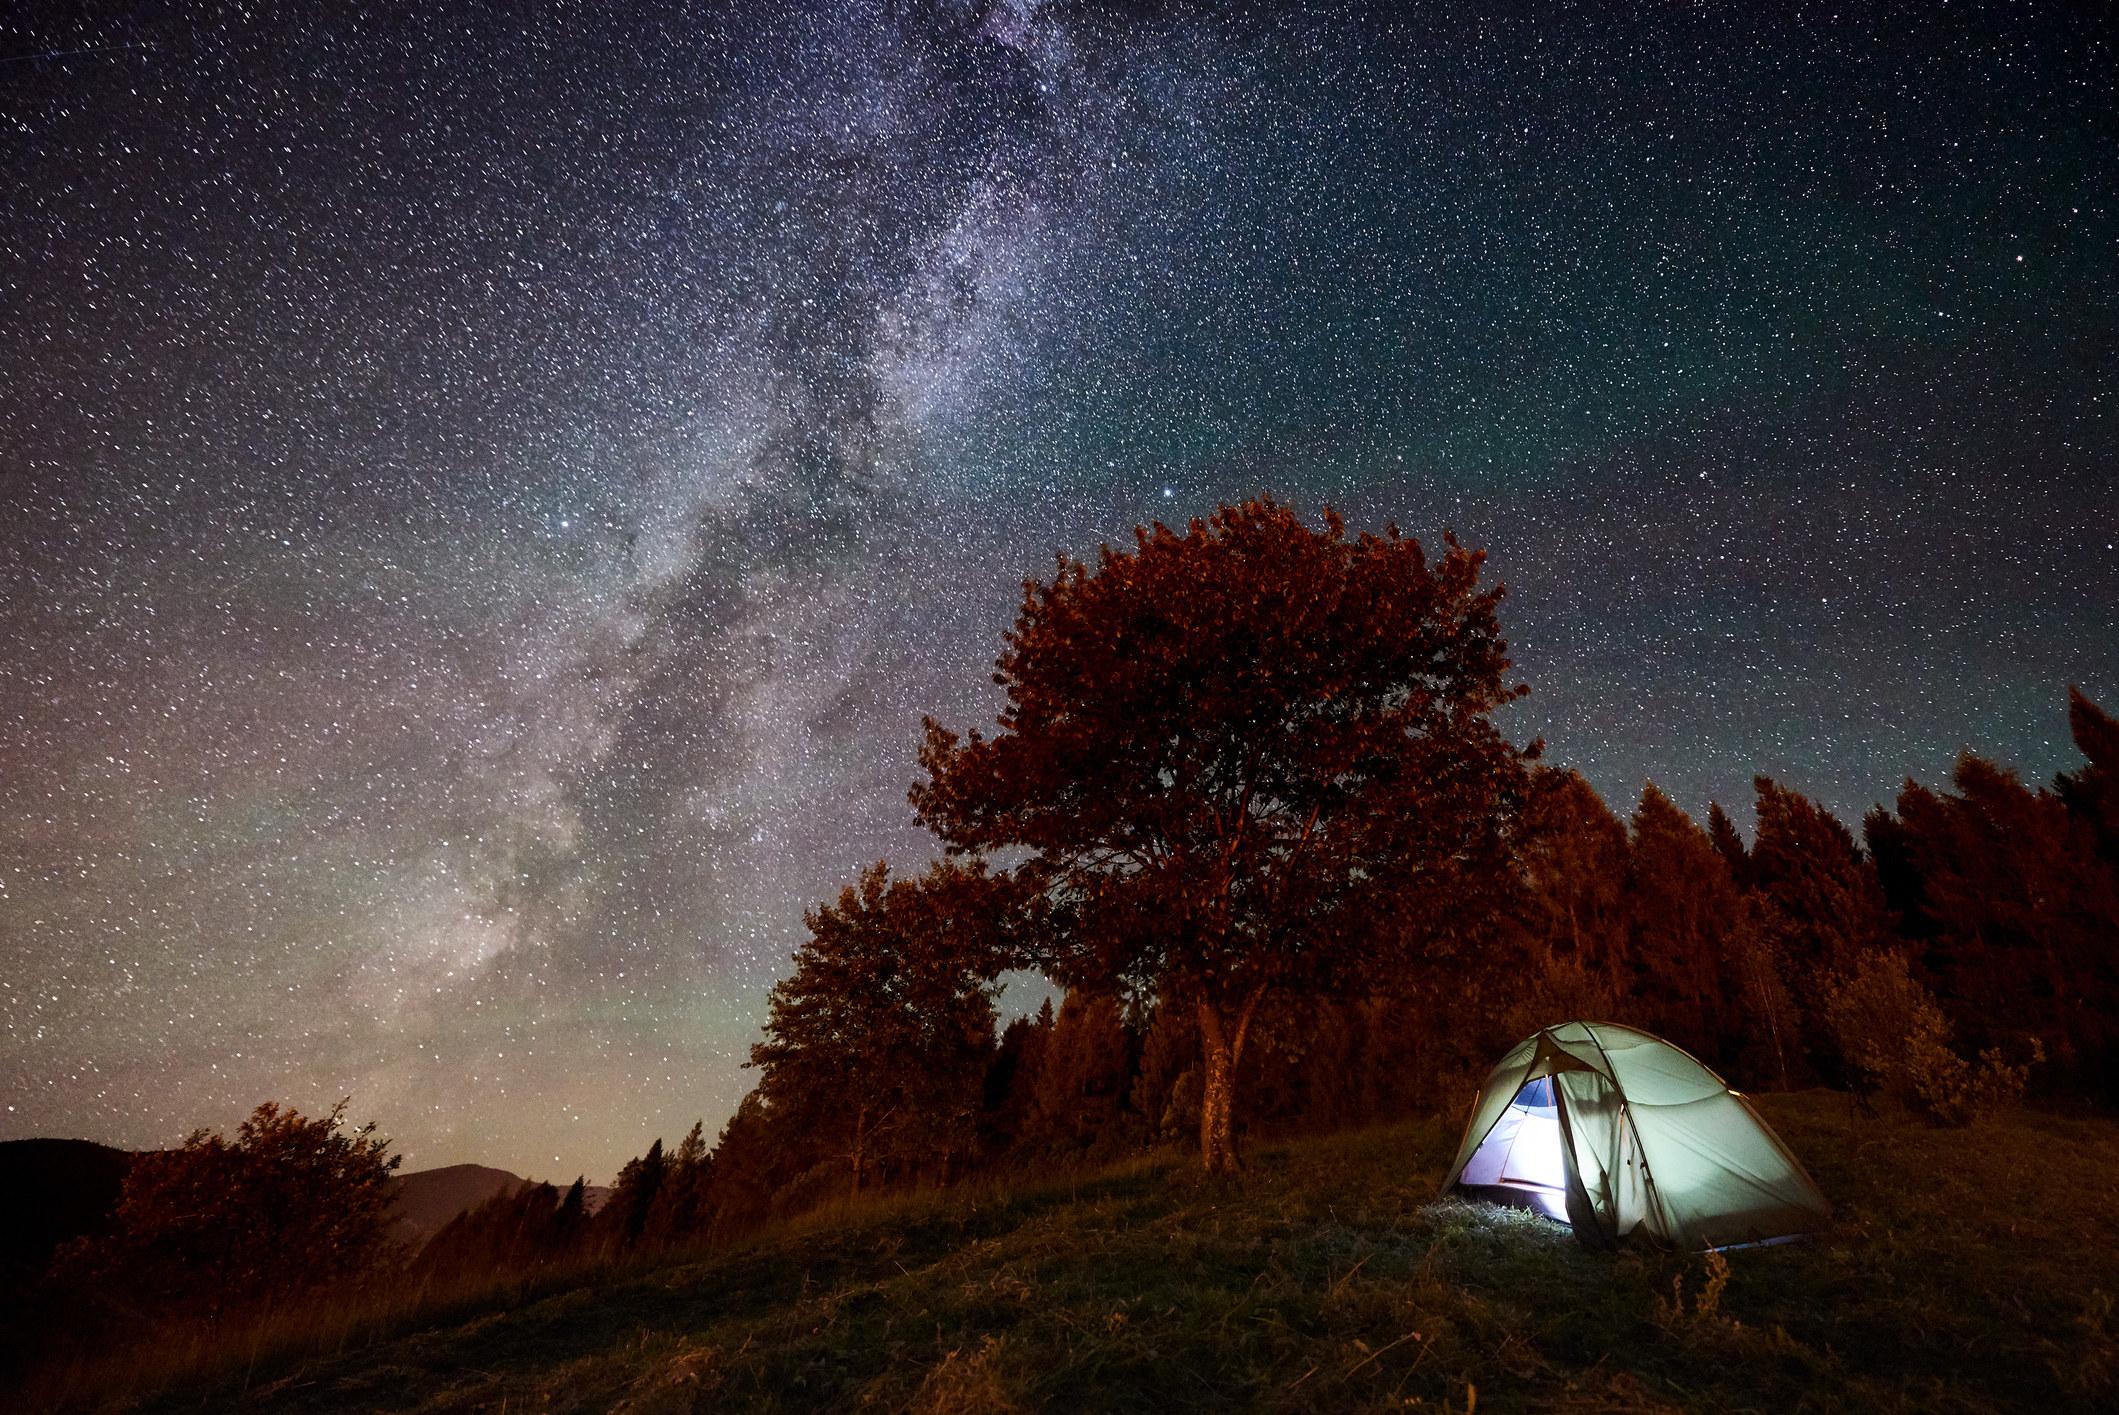 illuminated tent under starry night sky